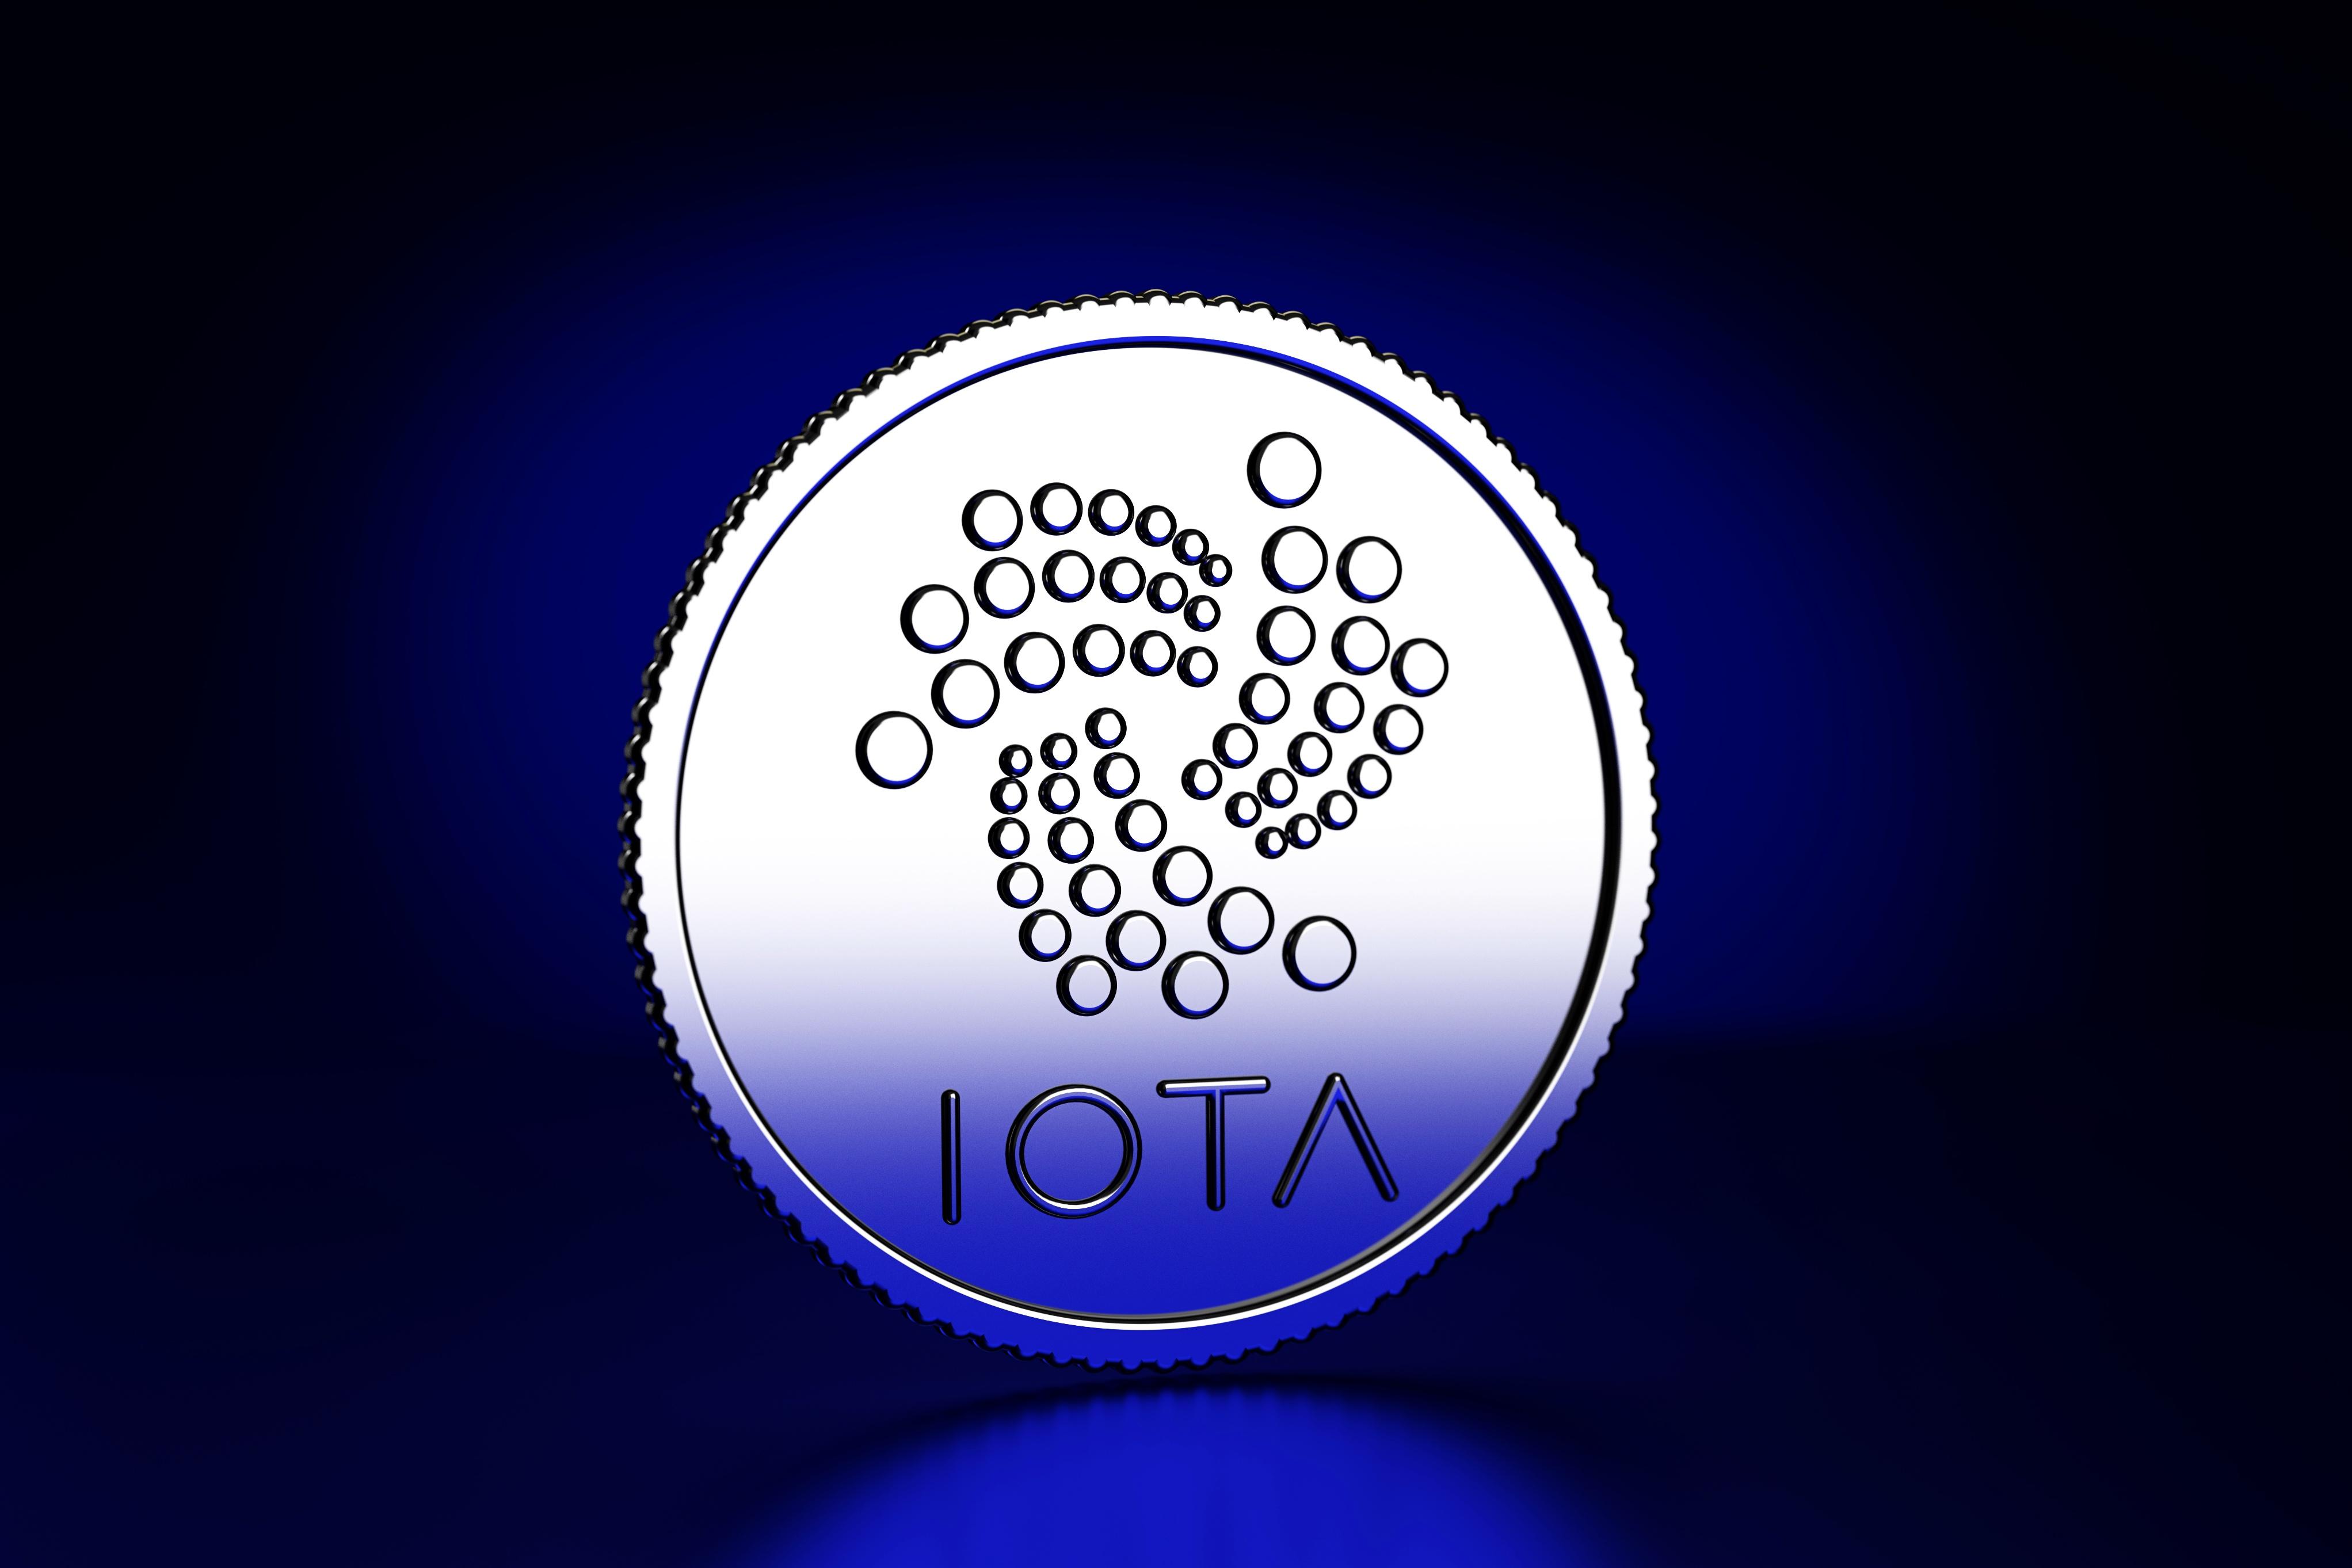 giá trị của IOTA